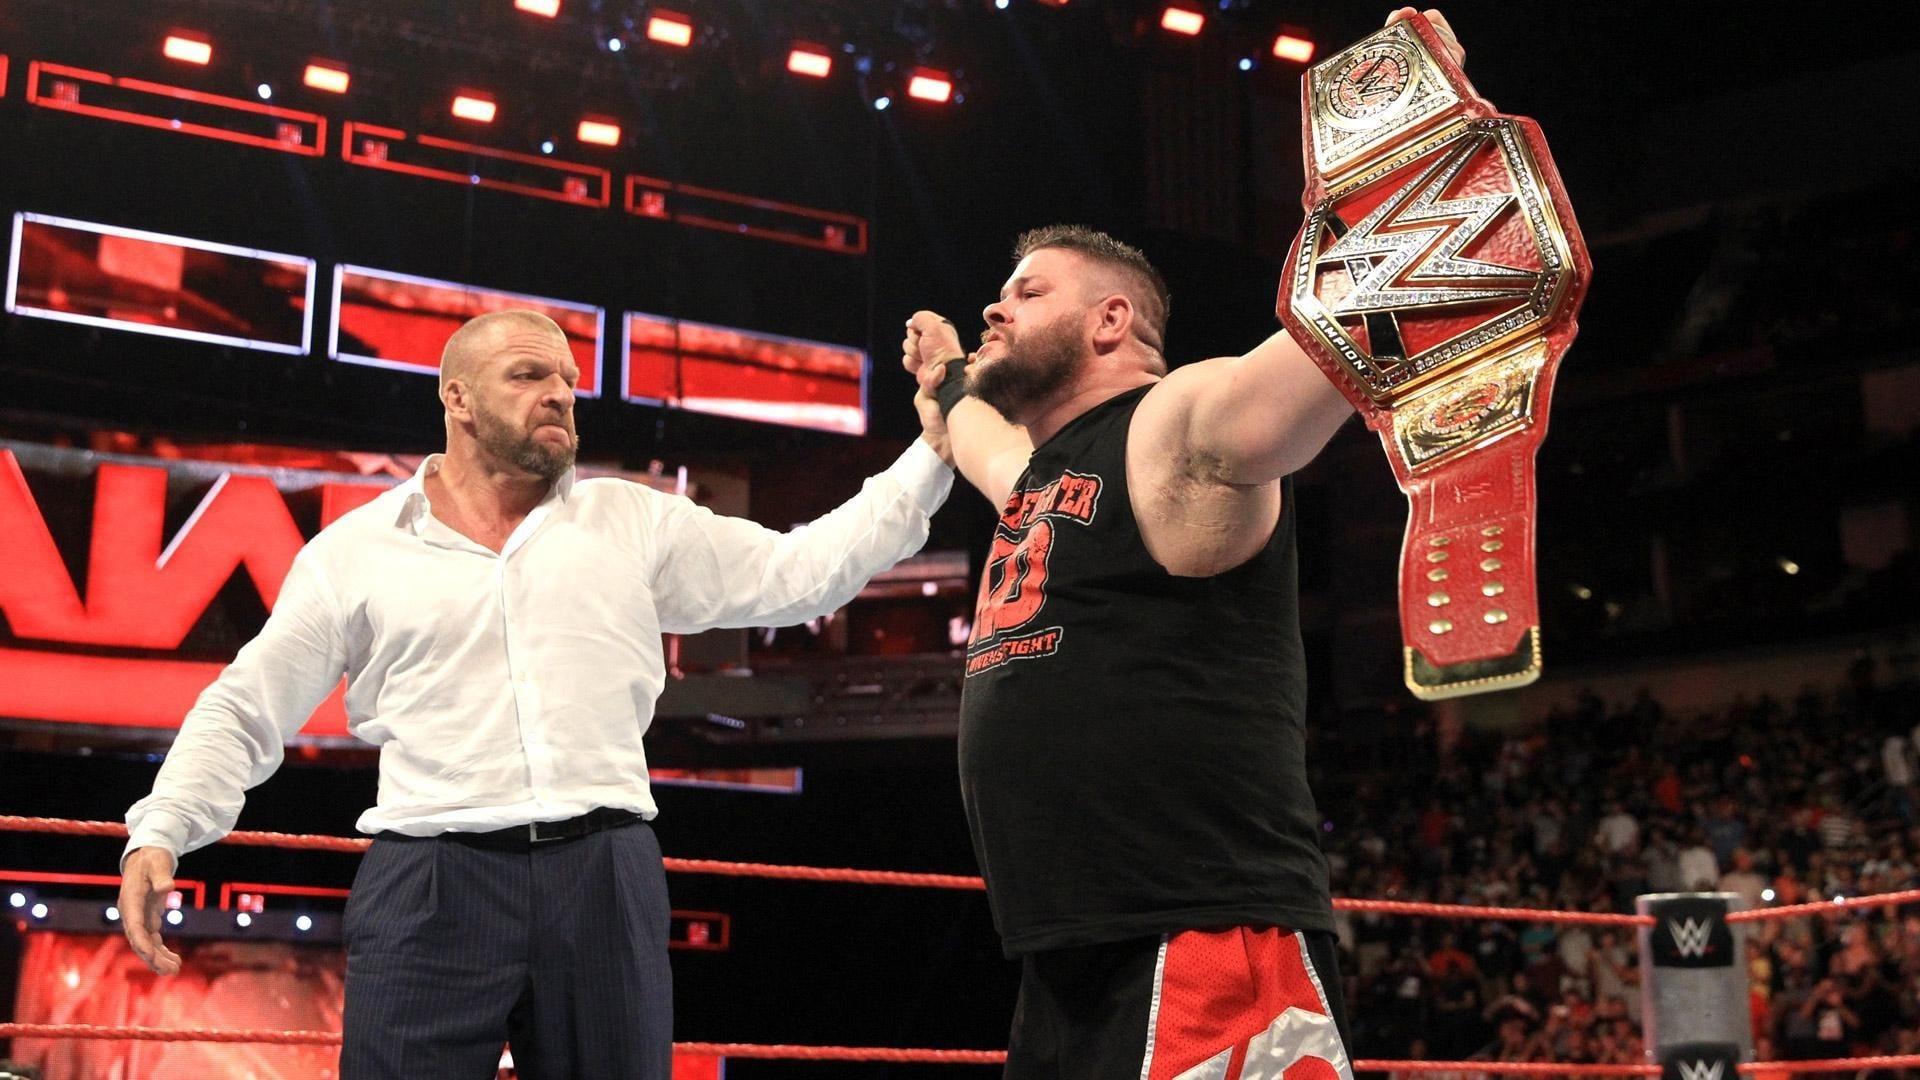 WWE Raw Season 24 :Episode 35  August 29, 2016 (Houston, TX)